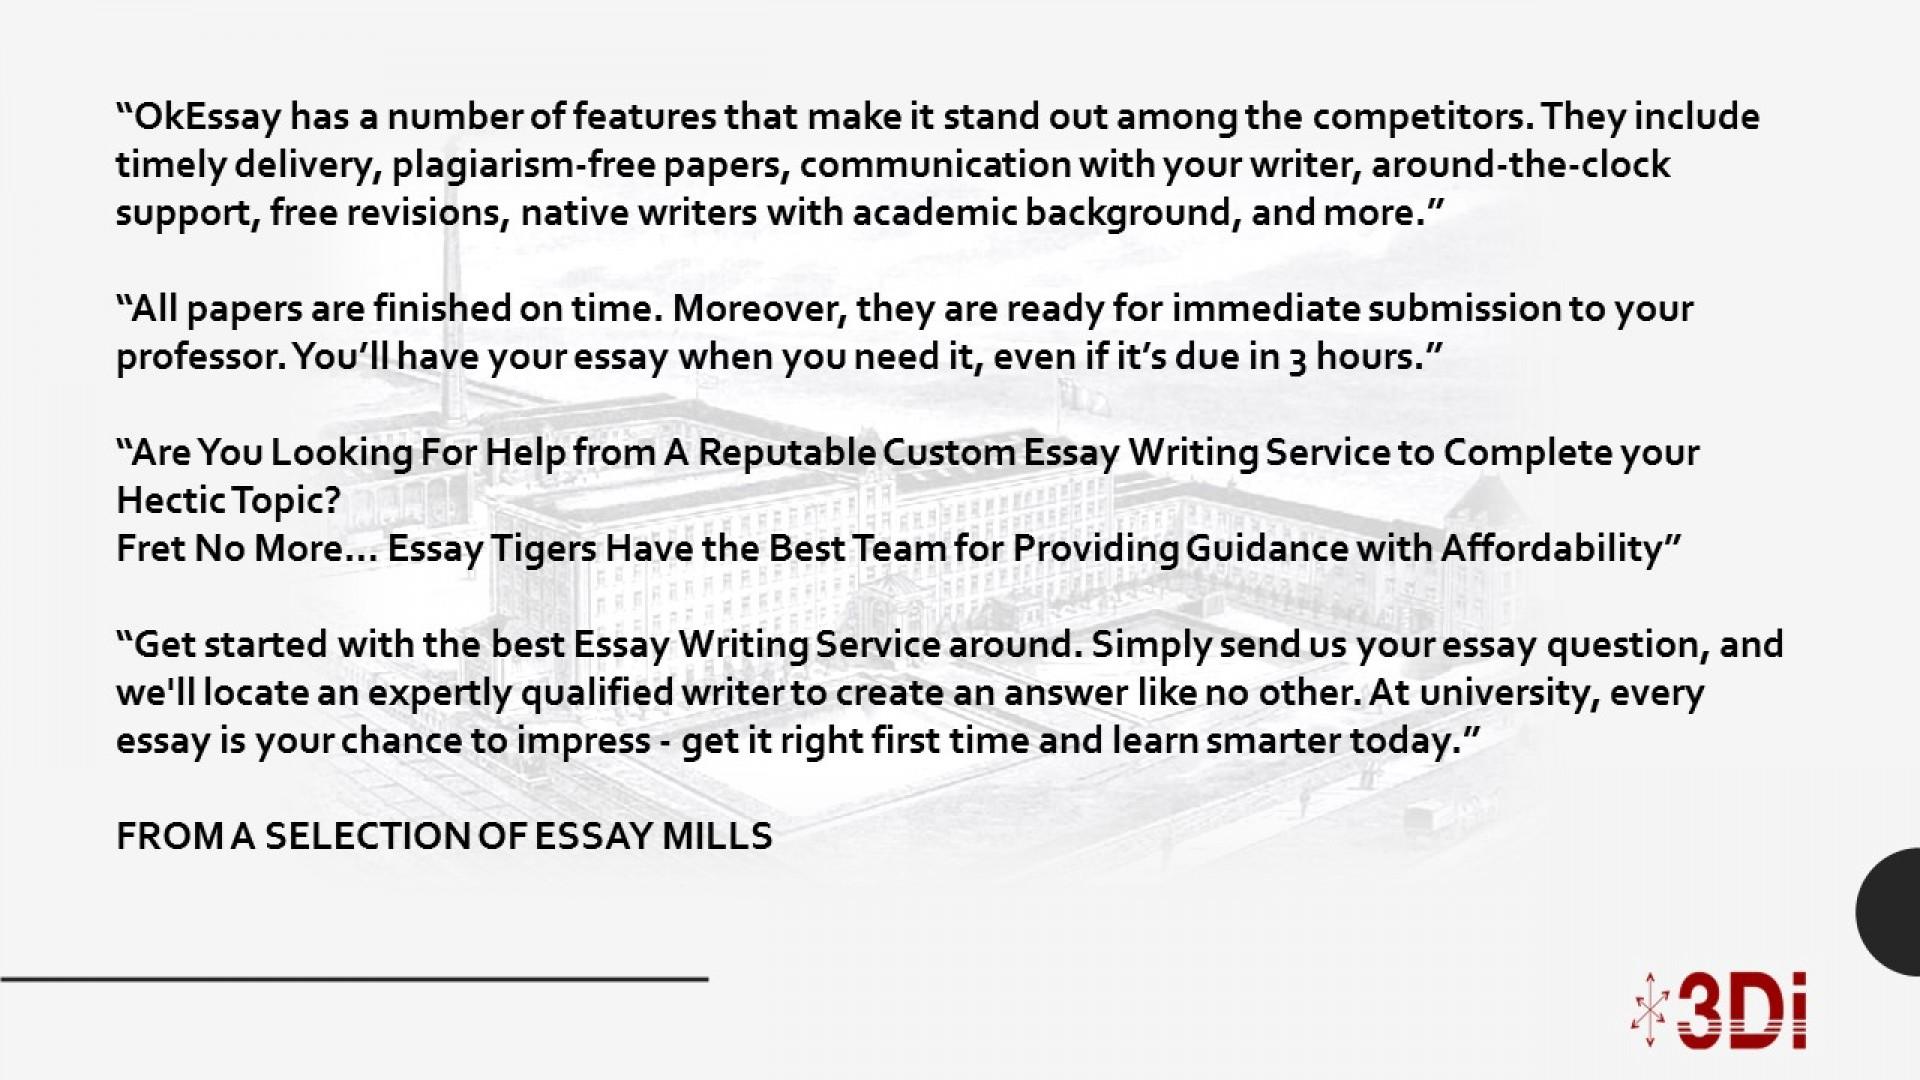 Essay mills legal